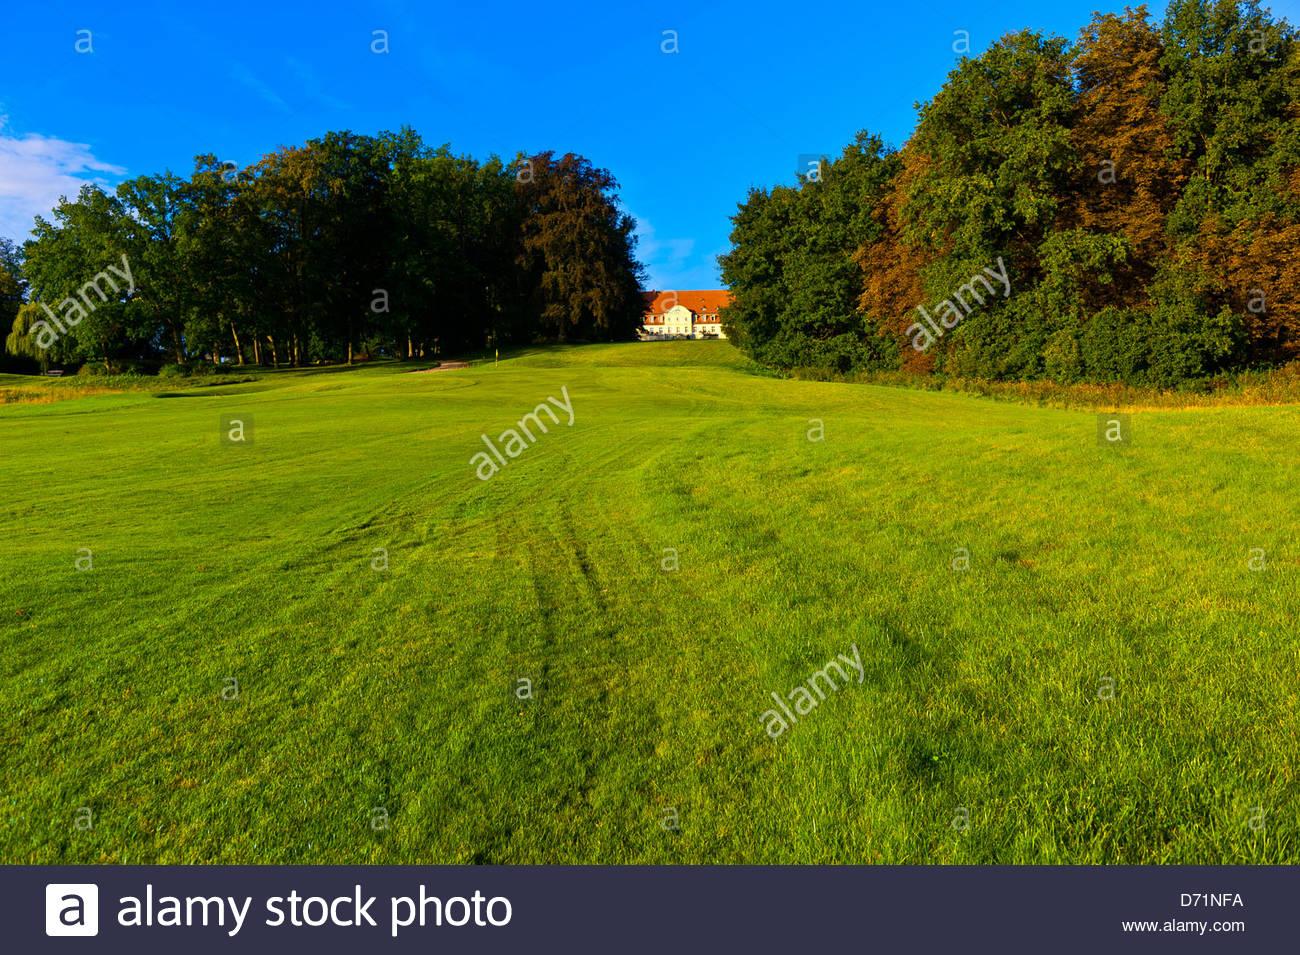 Golf course, Radisson Blu Resort Schloss Fleesensee (castle hotel), Fleesensee, Germany - Stock Image